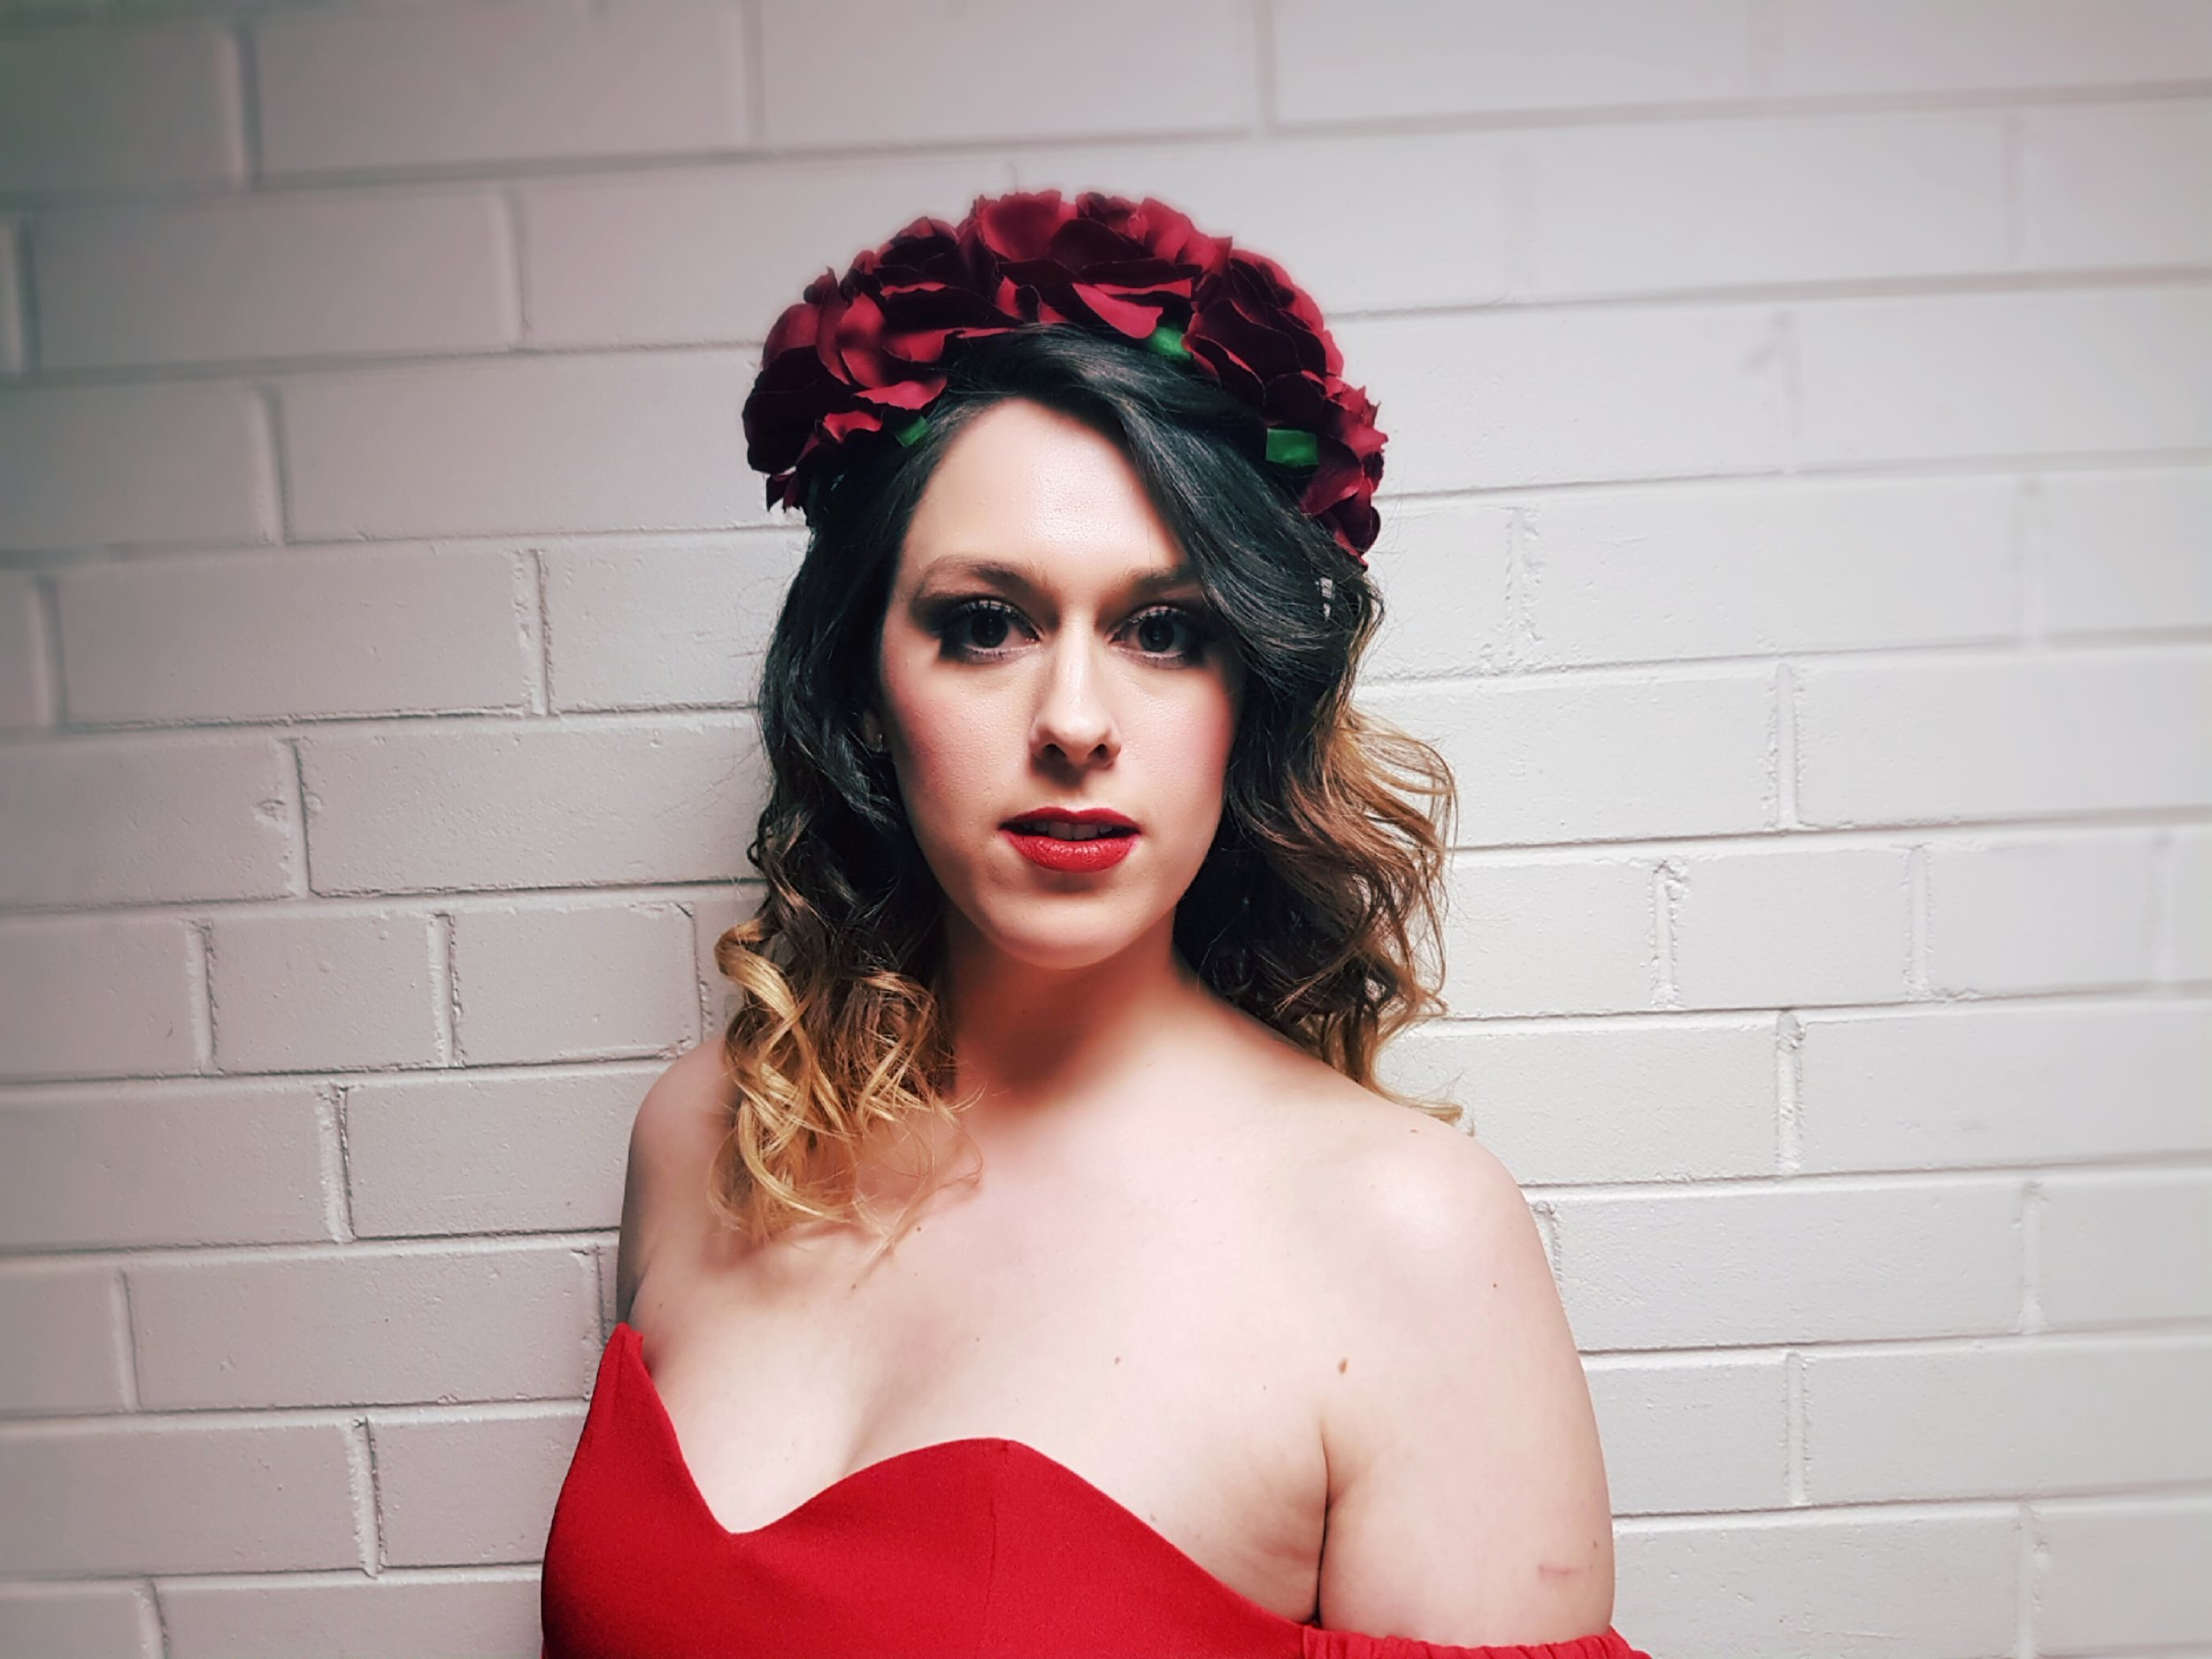 Bianca Majchr zak who will perform as Carmen for BK Opera